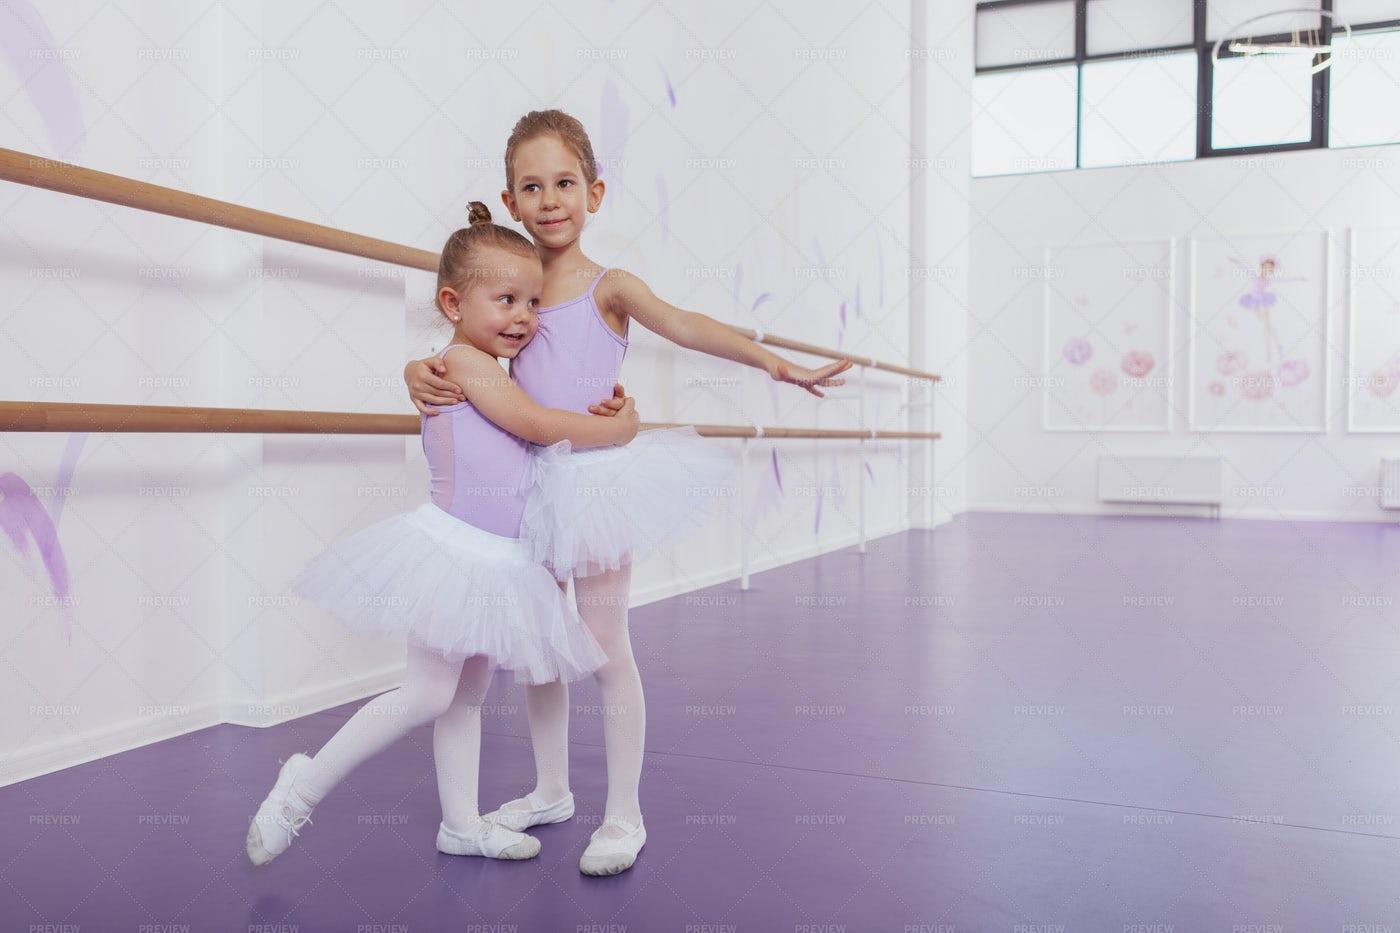 Children Practice Ballet Together: Stock Photos